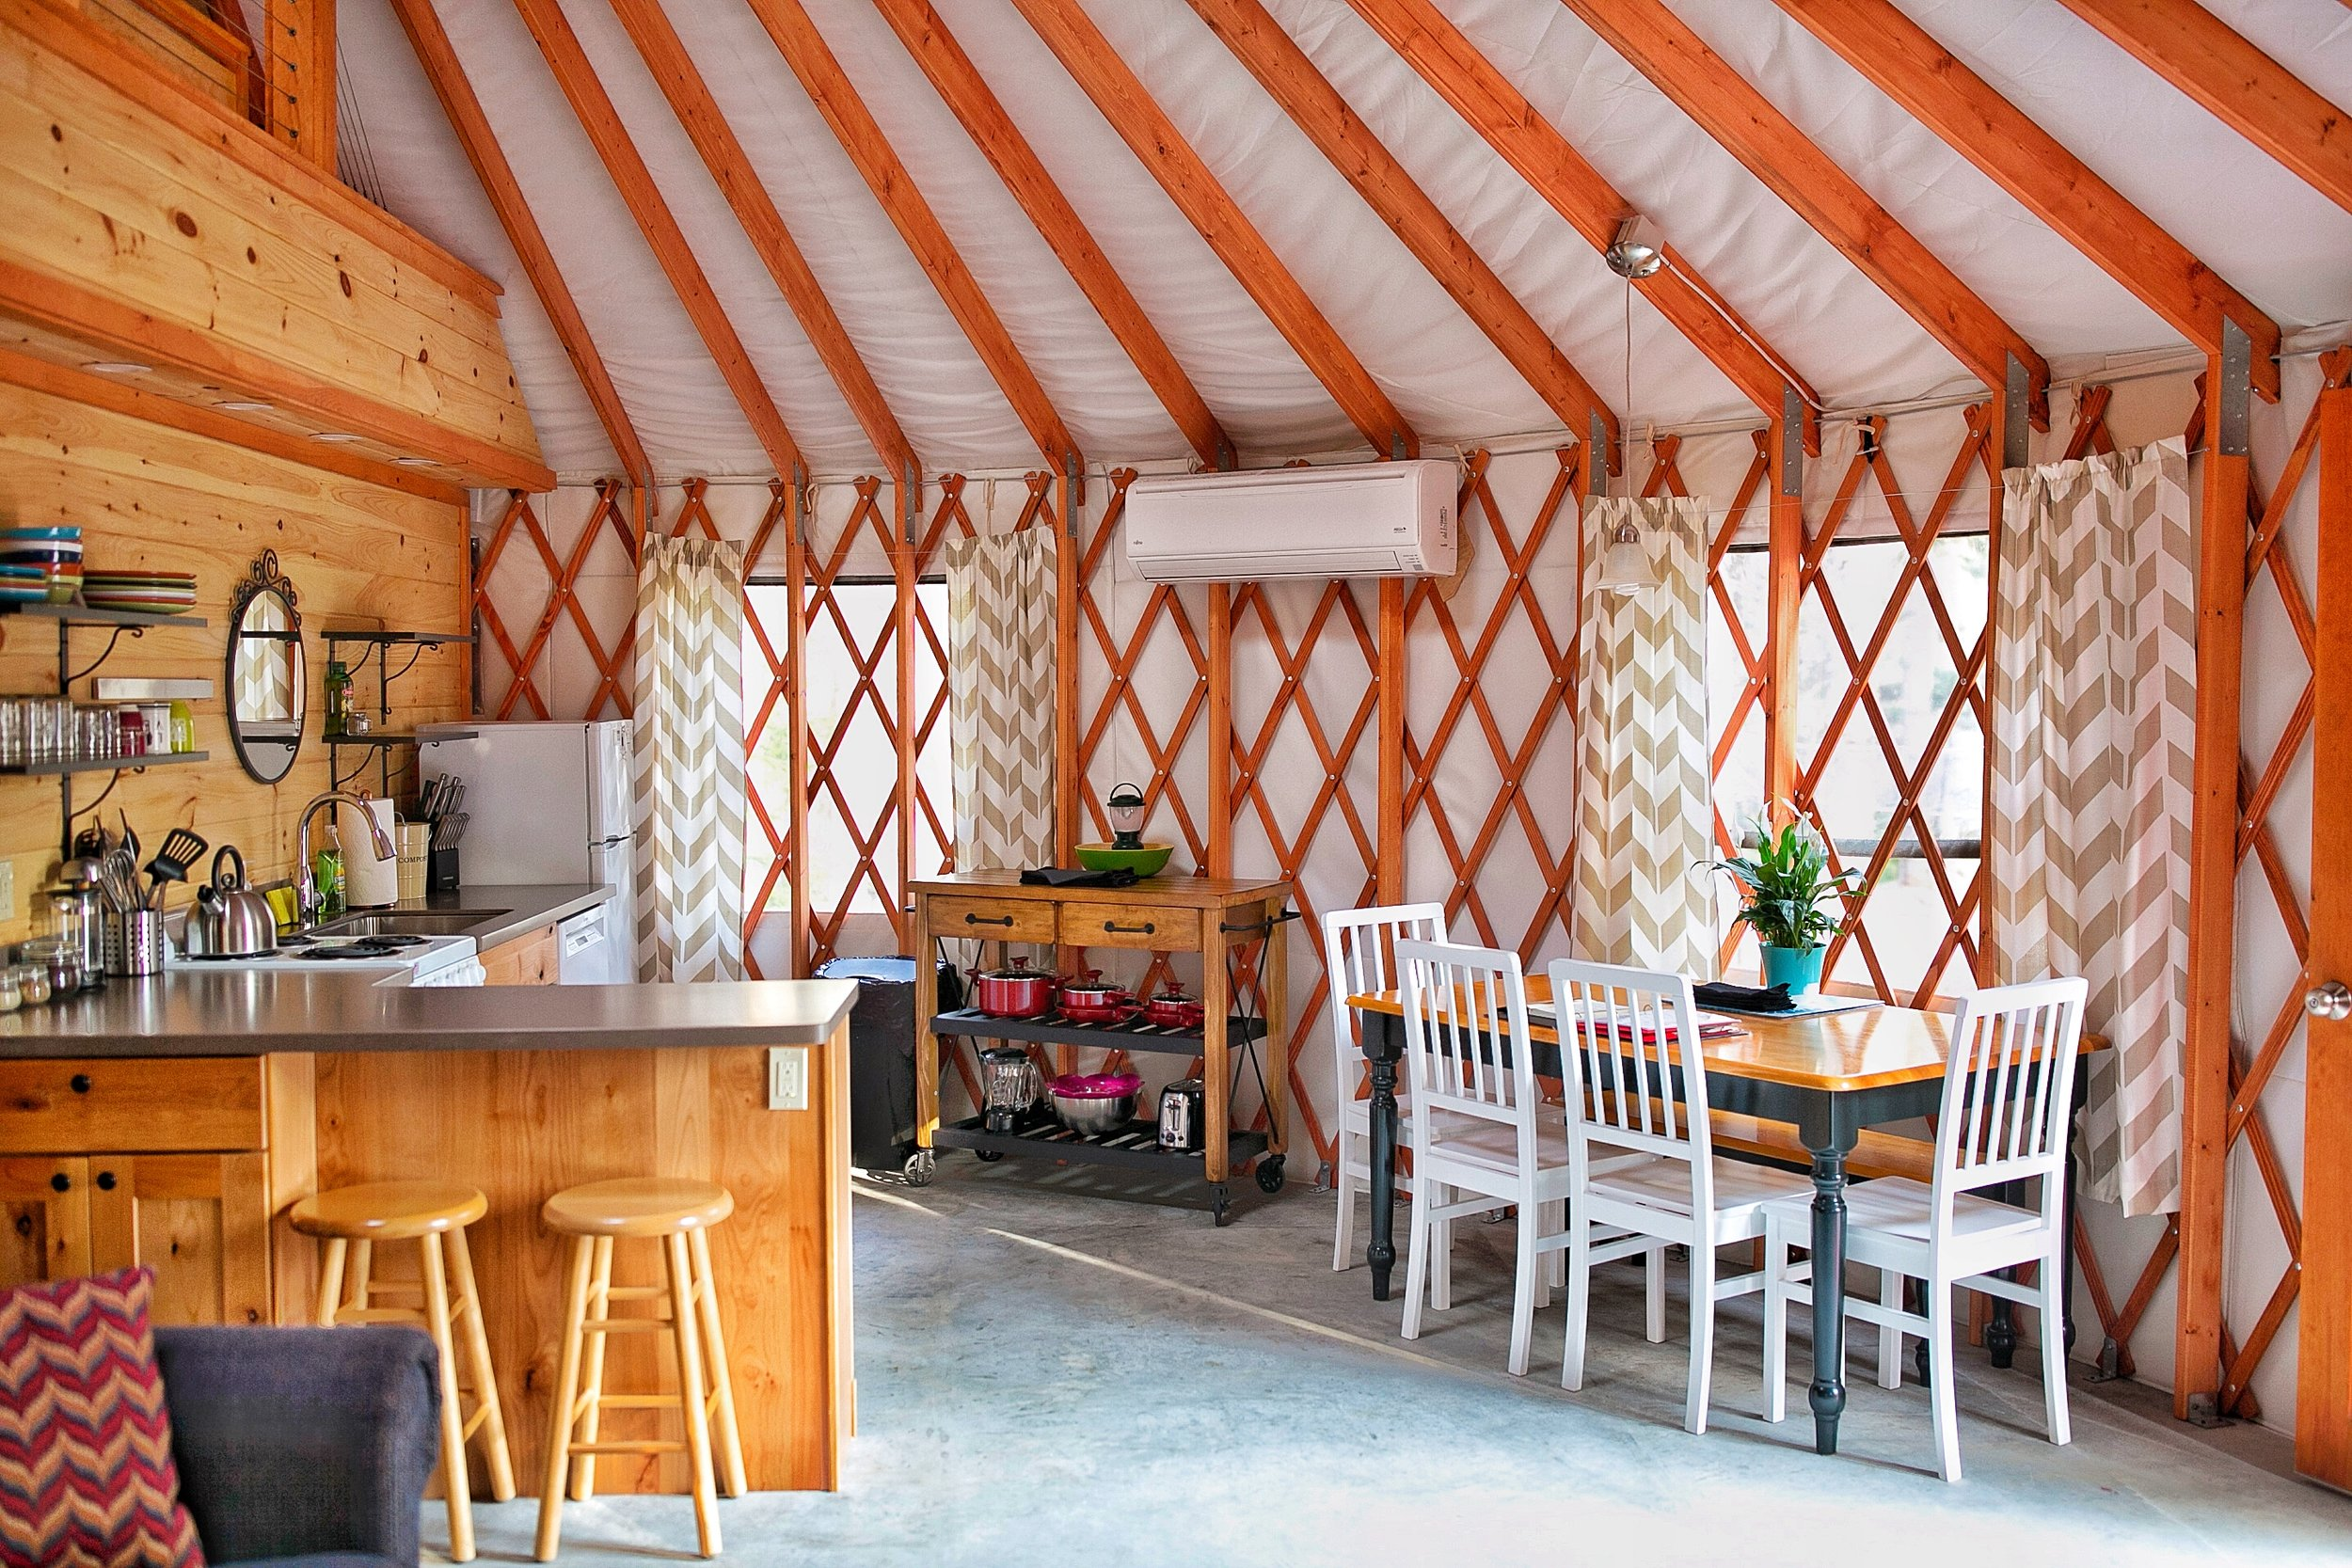 Acadia Yurts